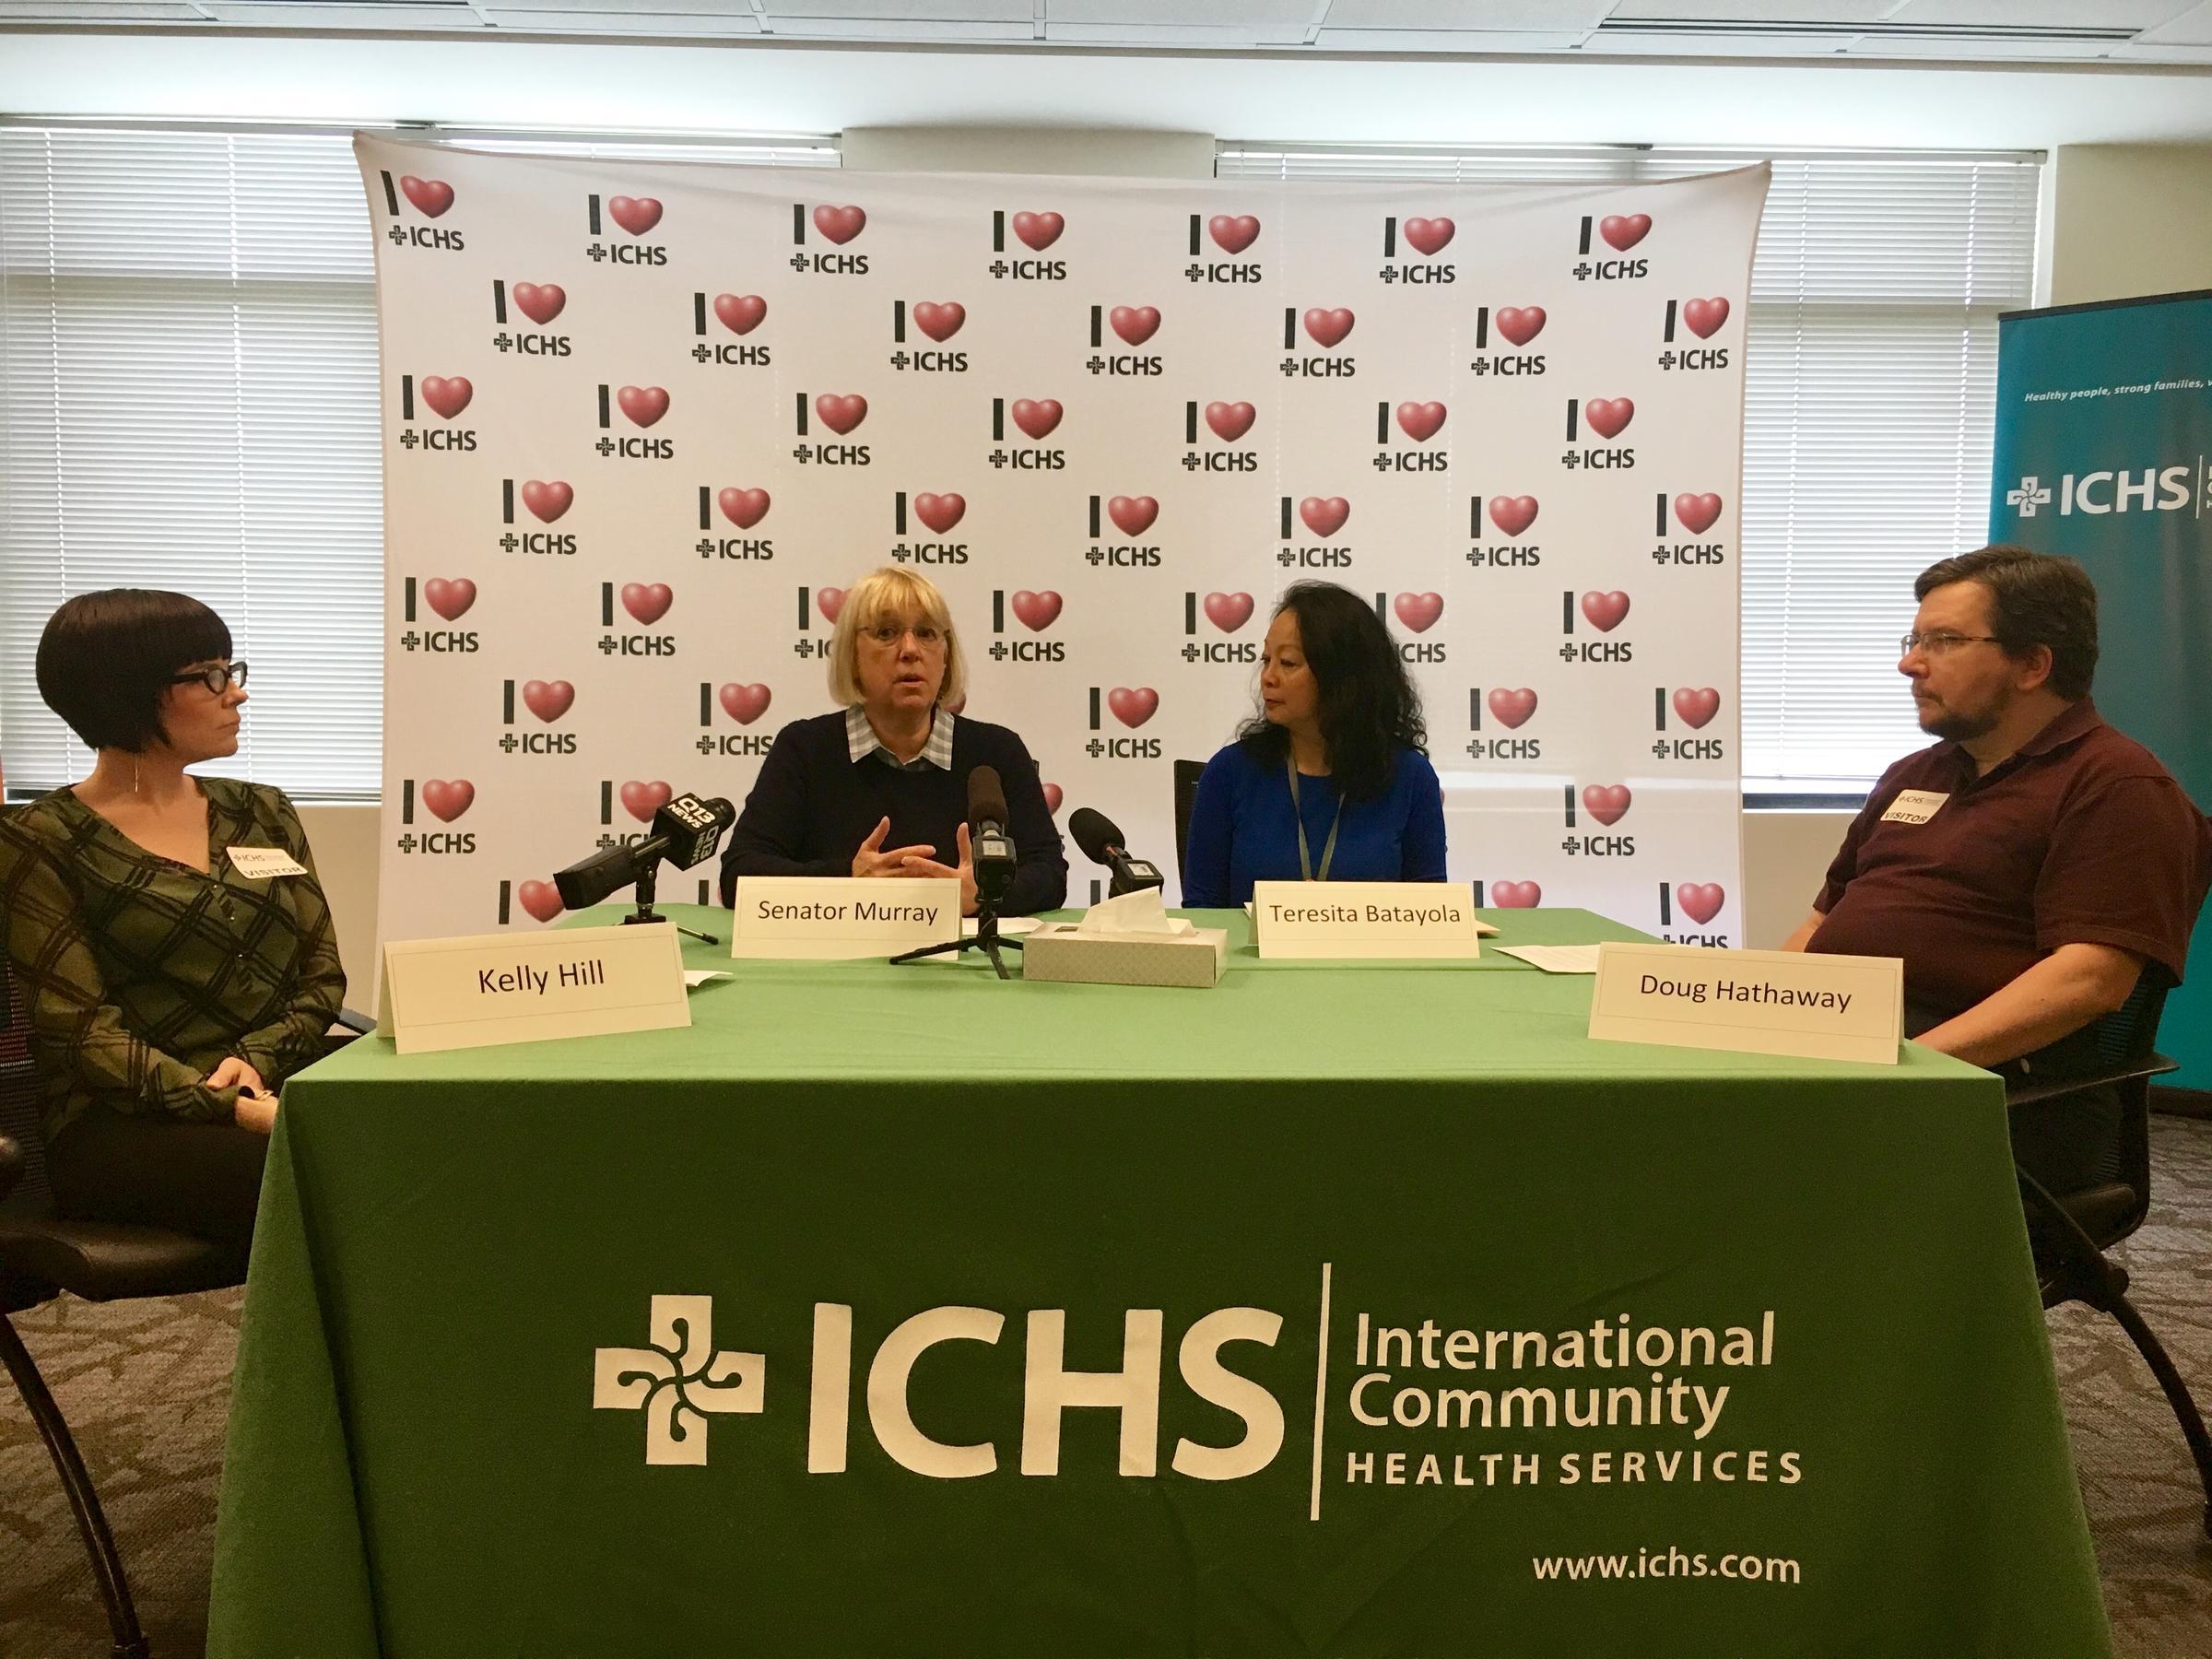 Democratic Washington Senator Patty Murray at International Community Health Services in Seattle